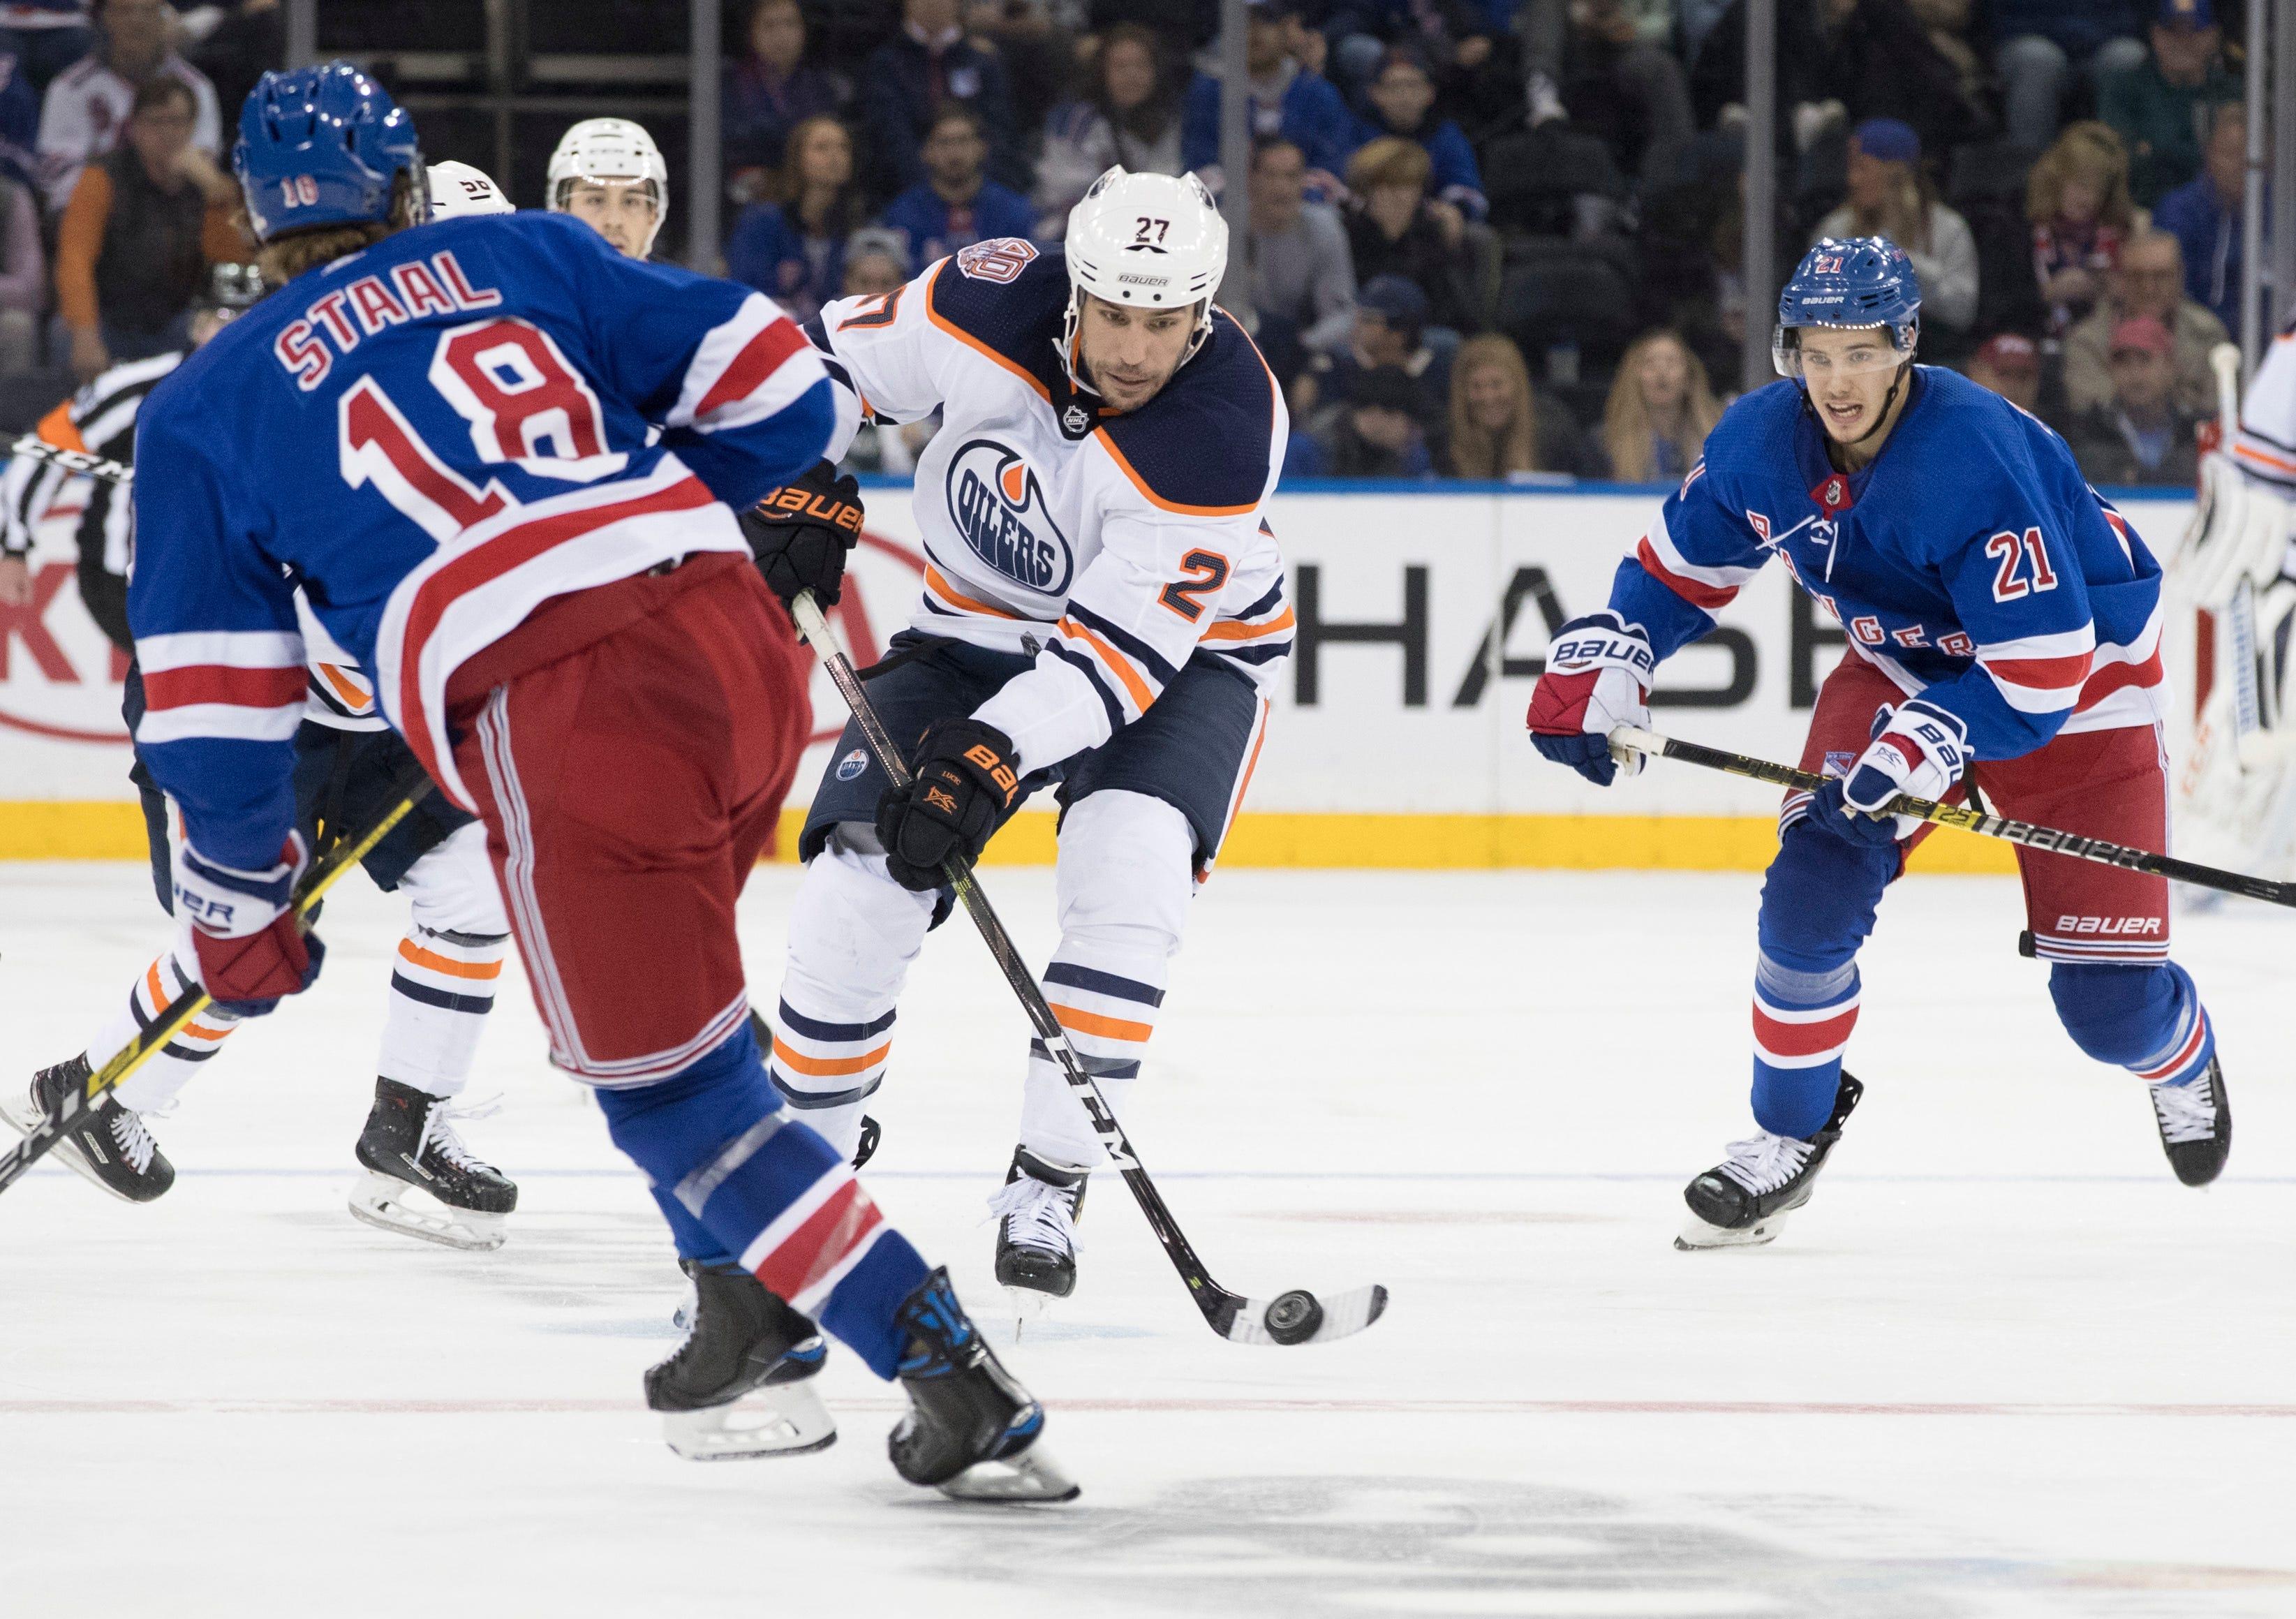 McDavid scores on power play, Oilers edge Rangers 2-1